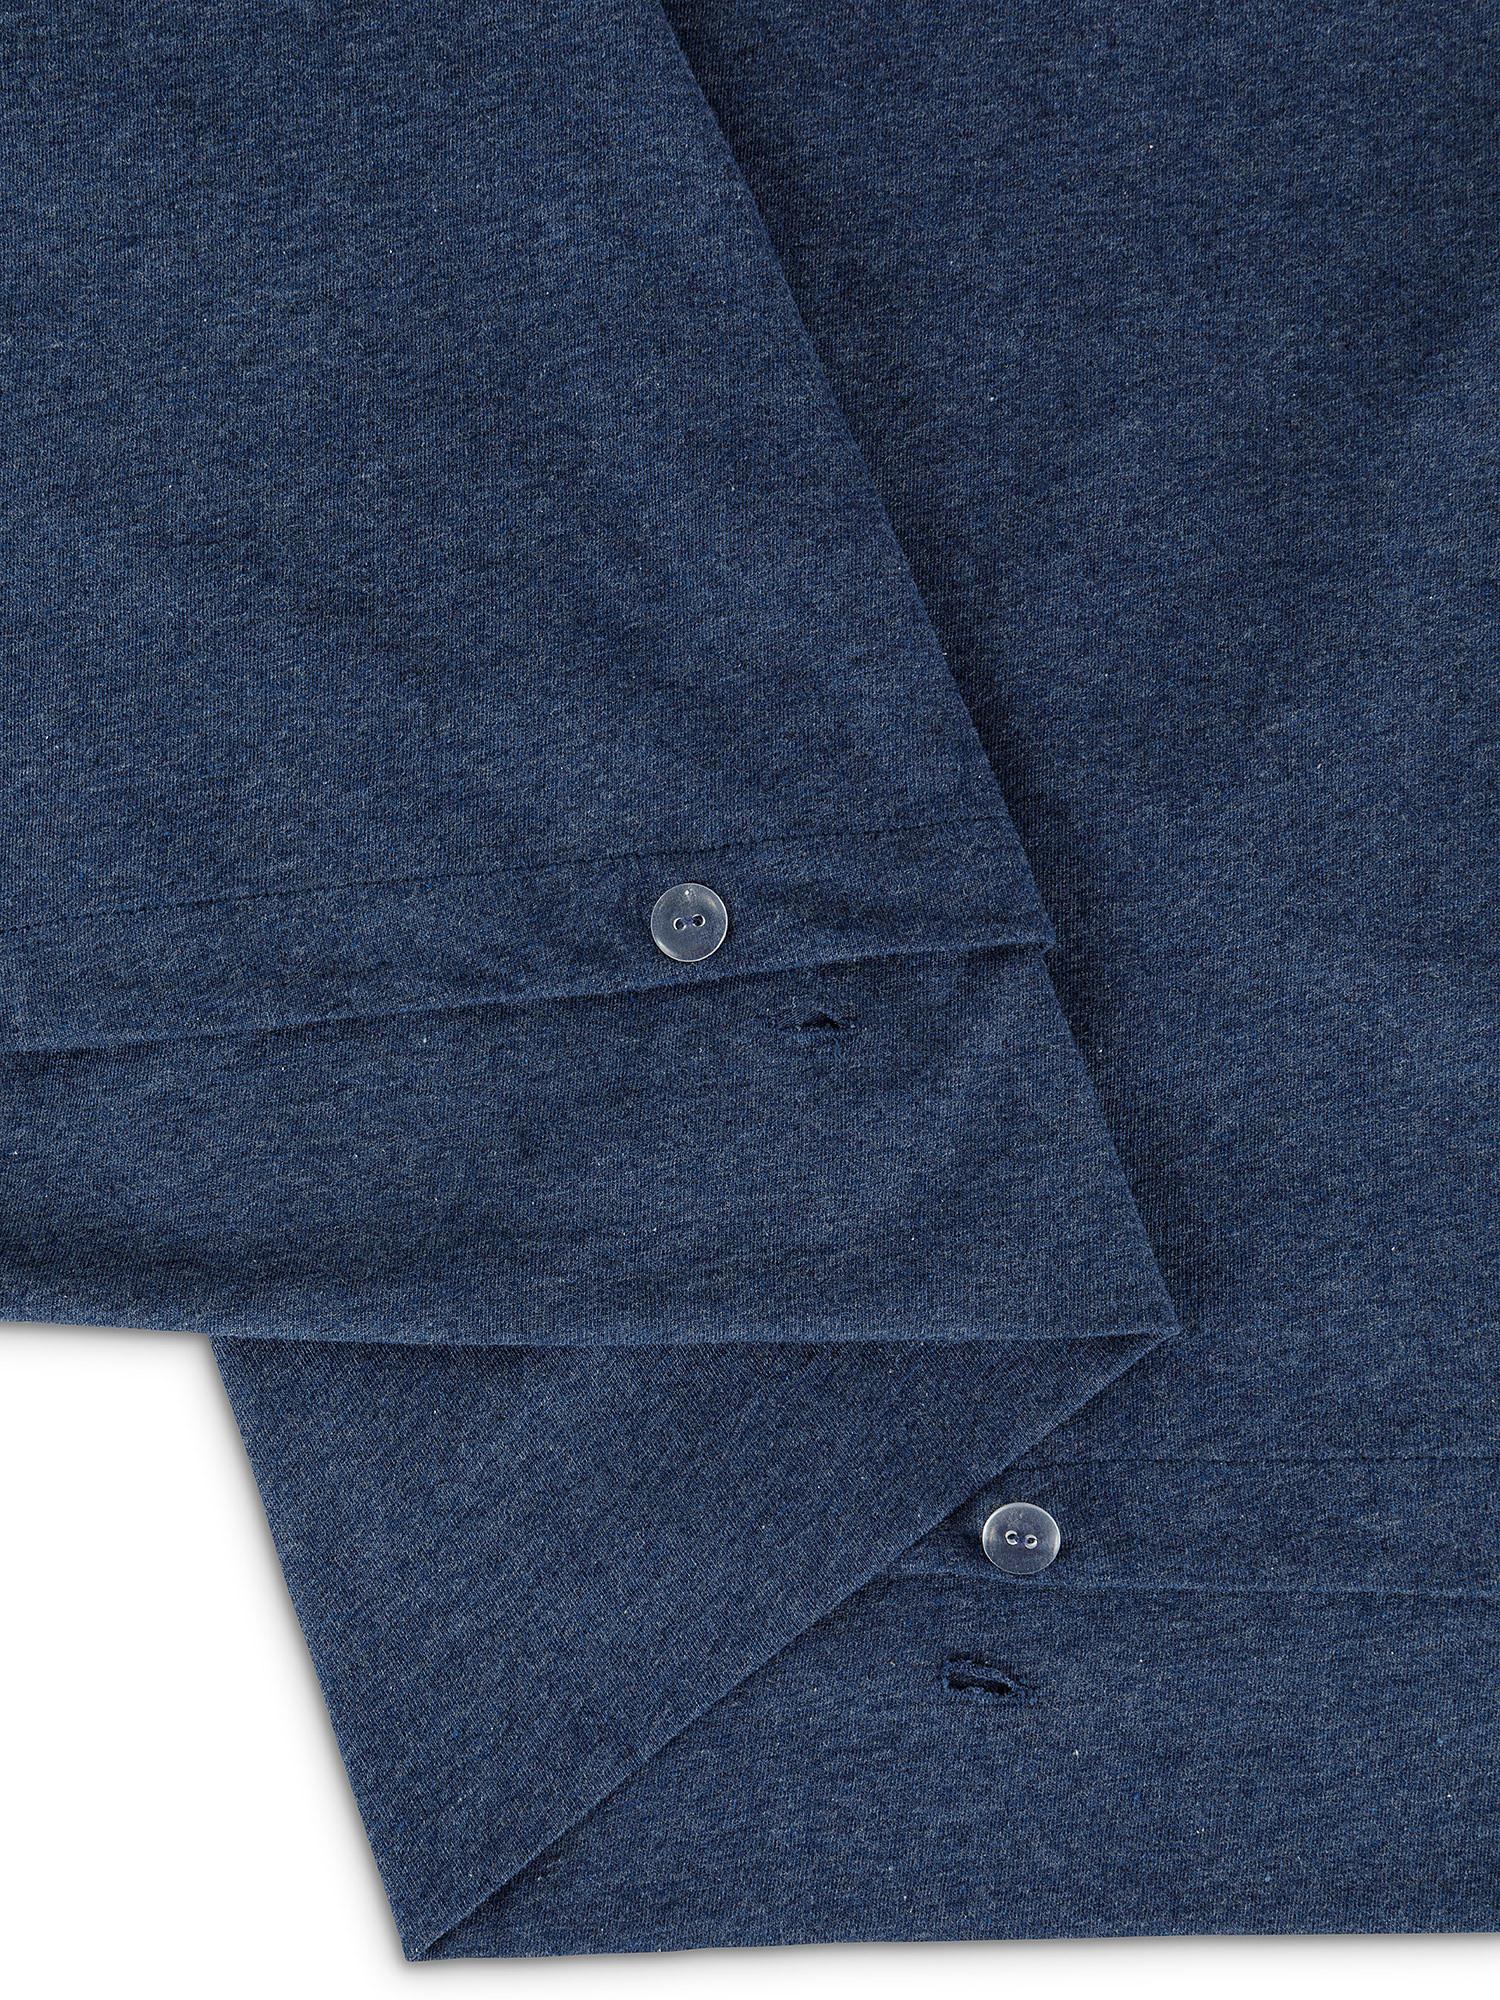 Parure copripiumino jersey di cotone tinta unita, Blu, large image number 1